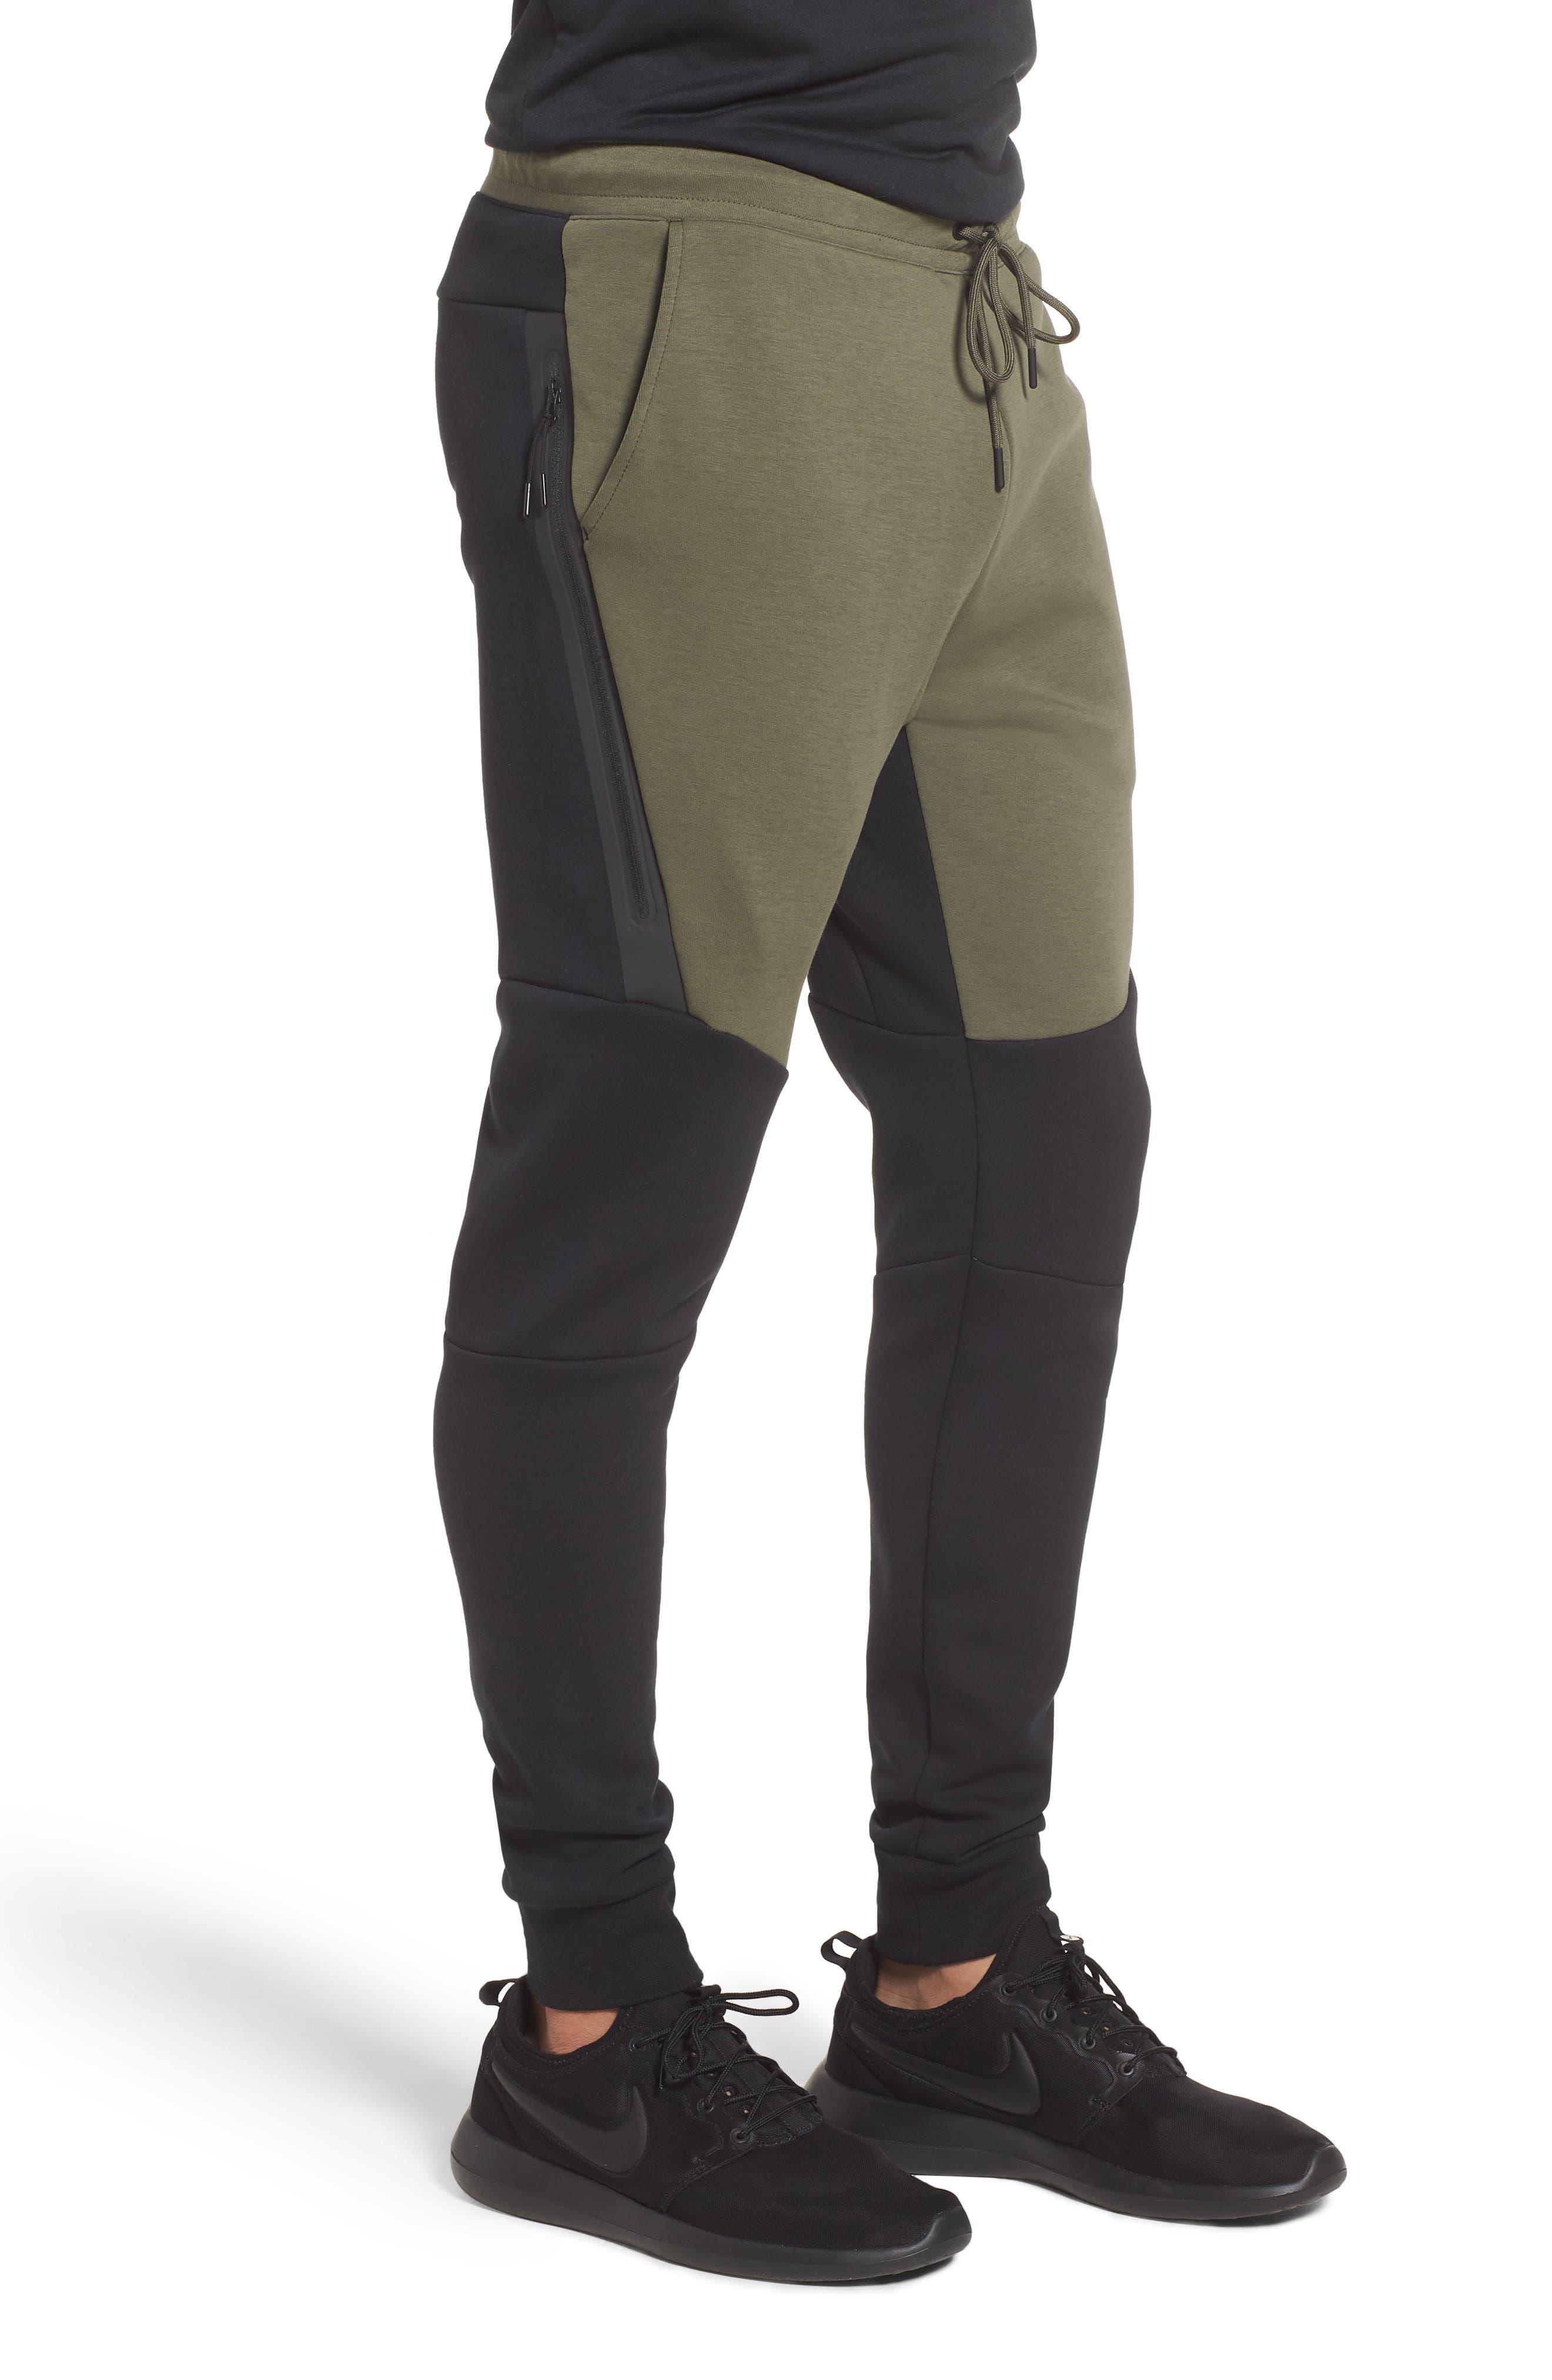 Tech Fleece Jogger Pants,                             Alternate thumbnail 3, color,                             BLACK/ TWILIGHT MARSH/ BLACK